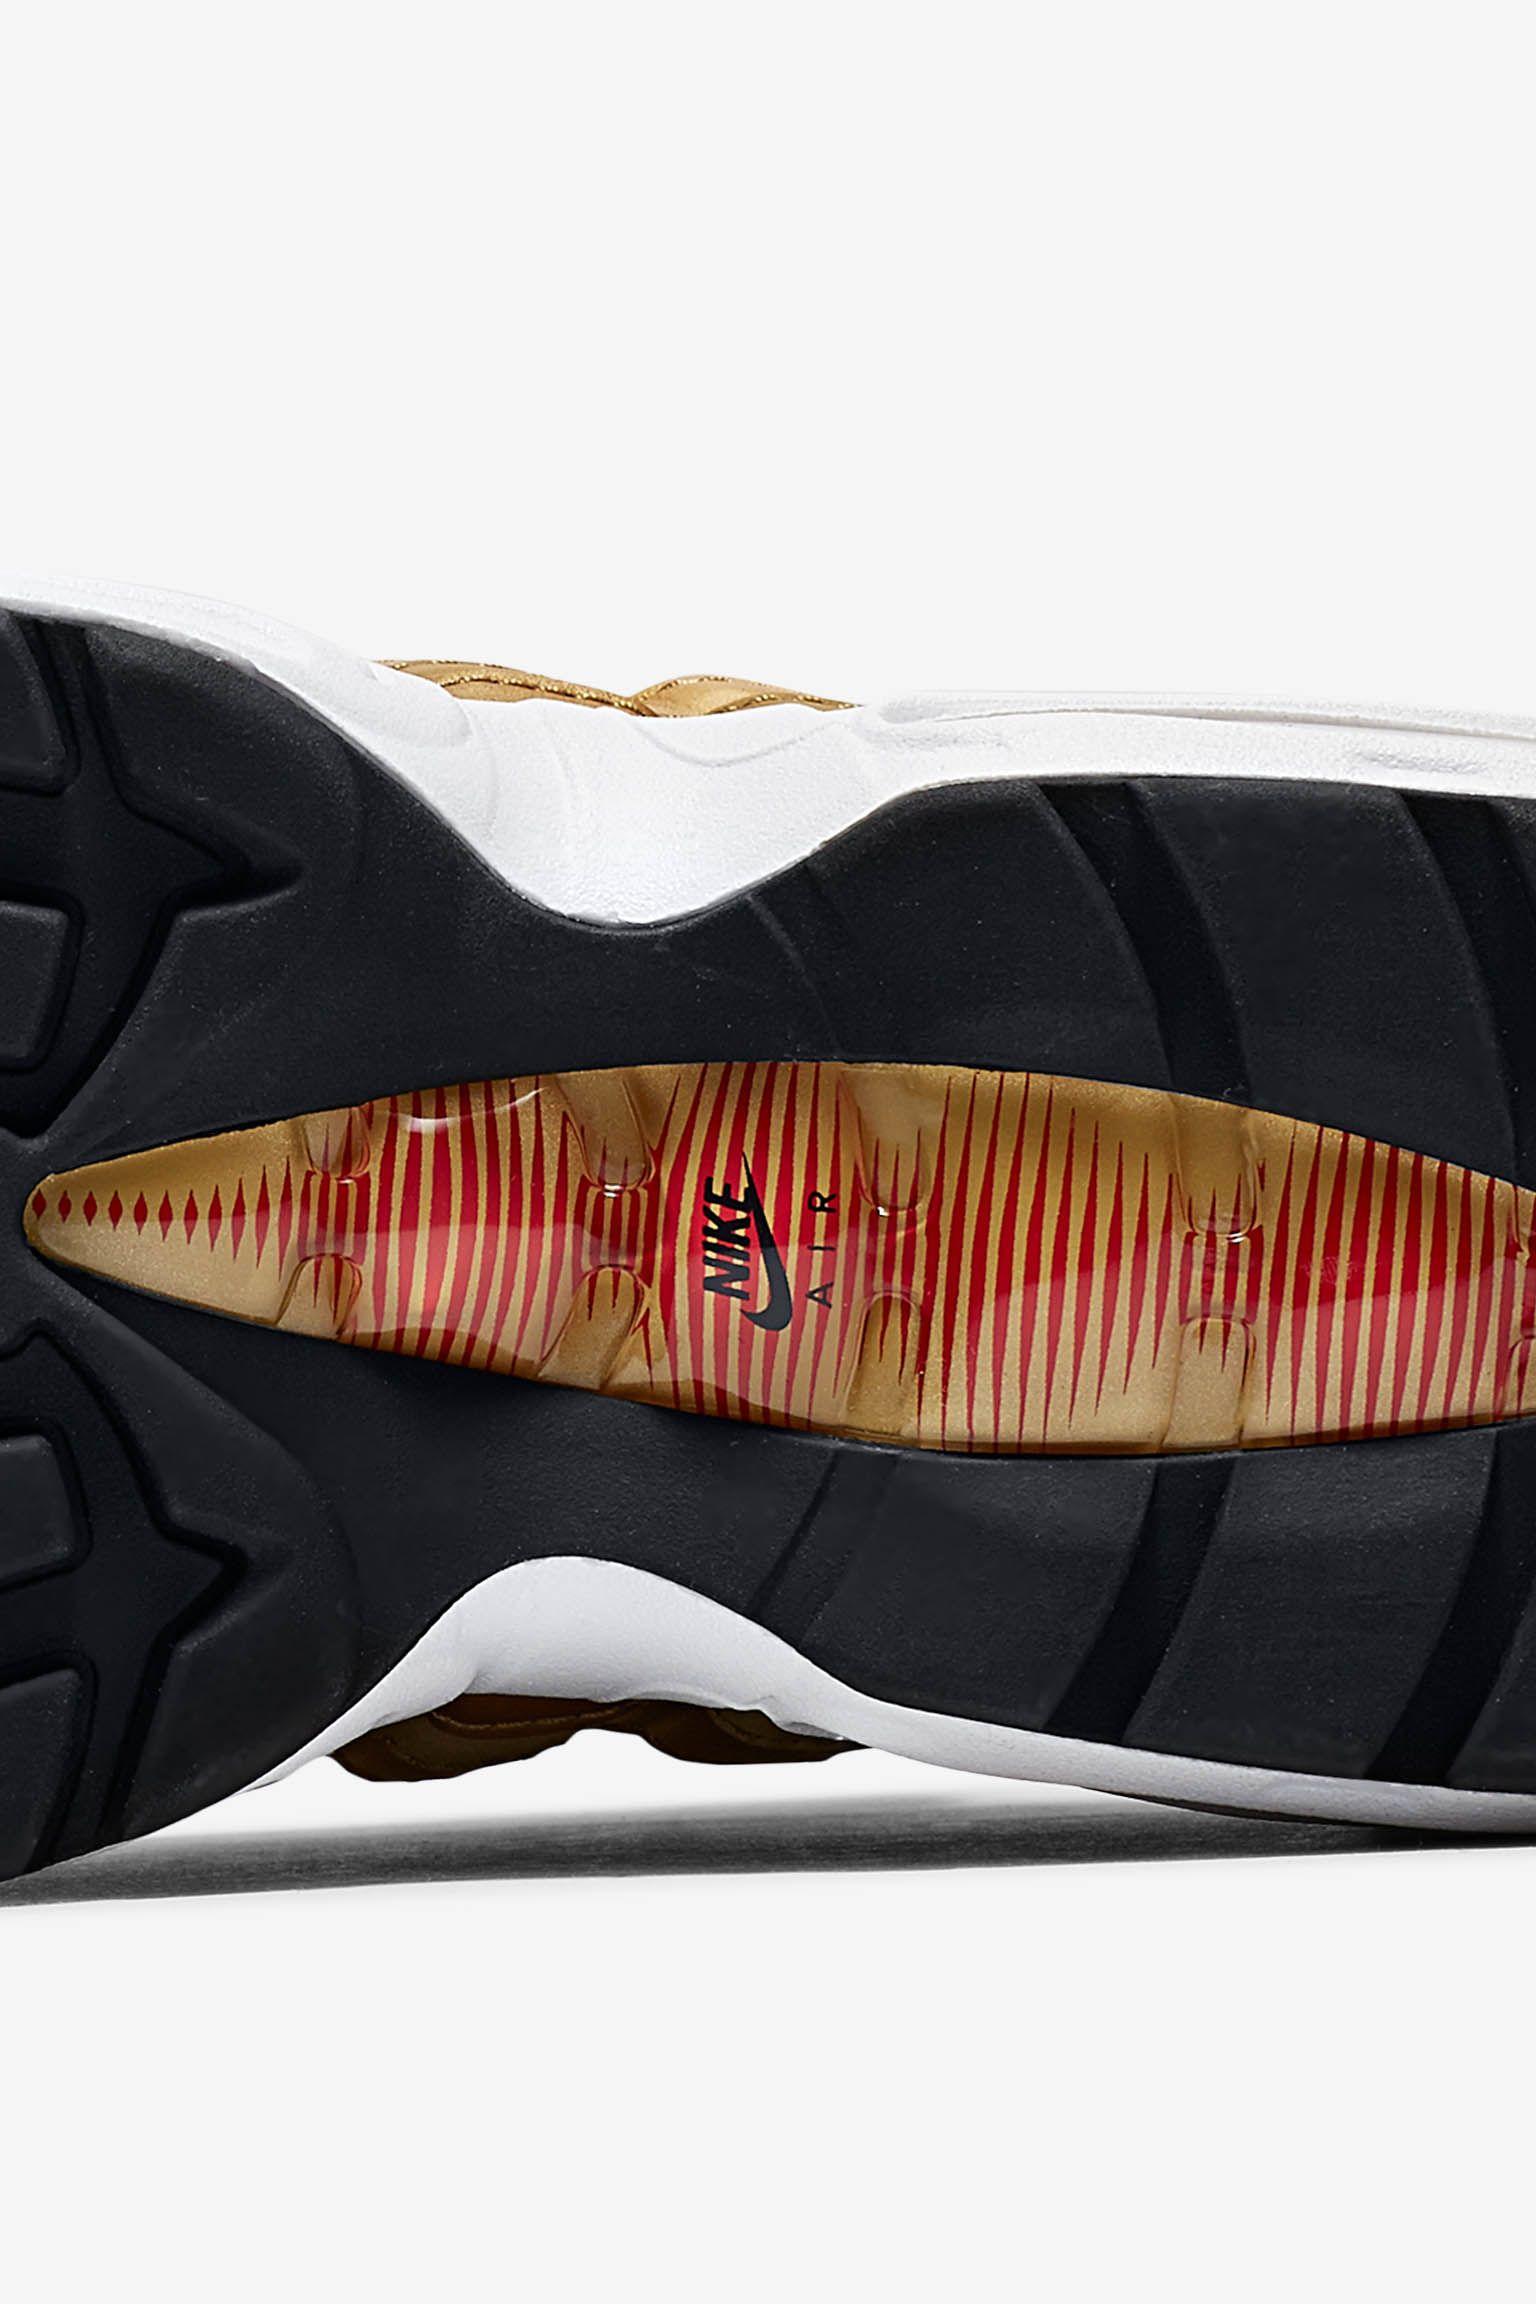 Women's Nike Air Max 95 'Metallic Gold' Release Date